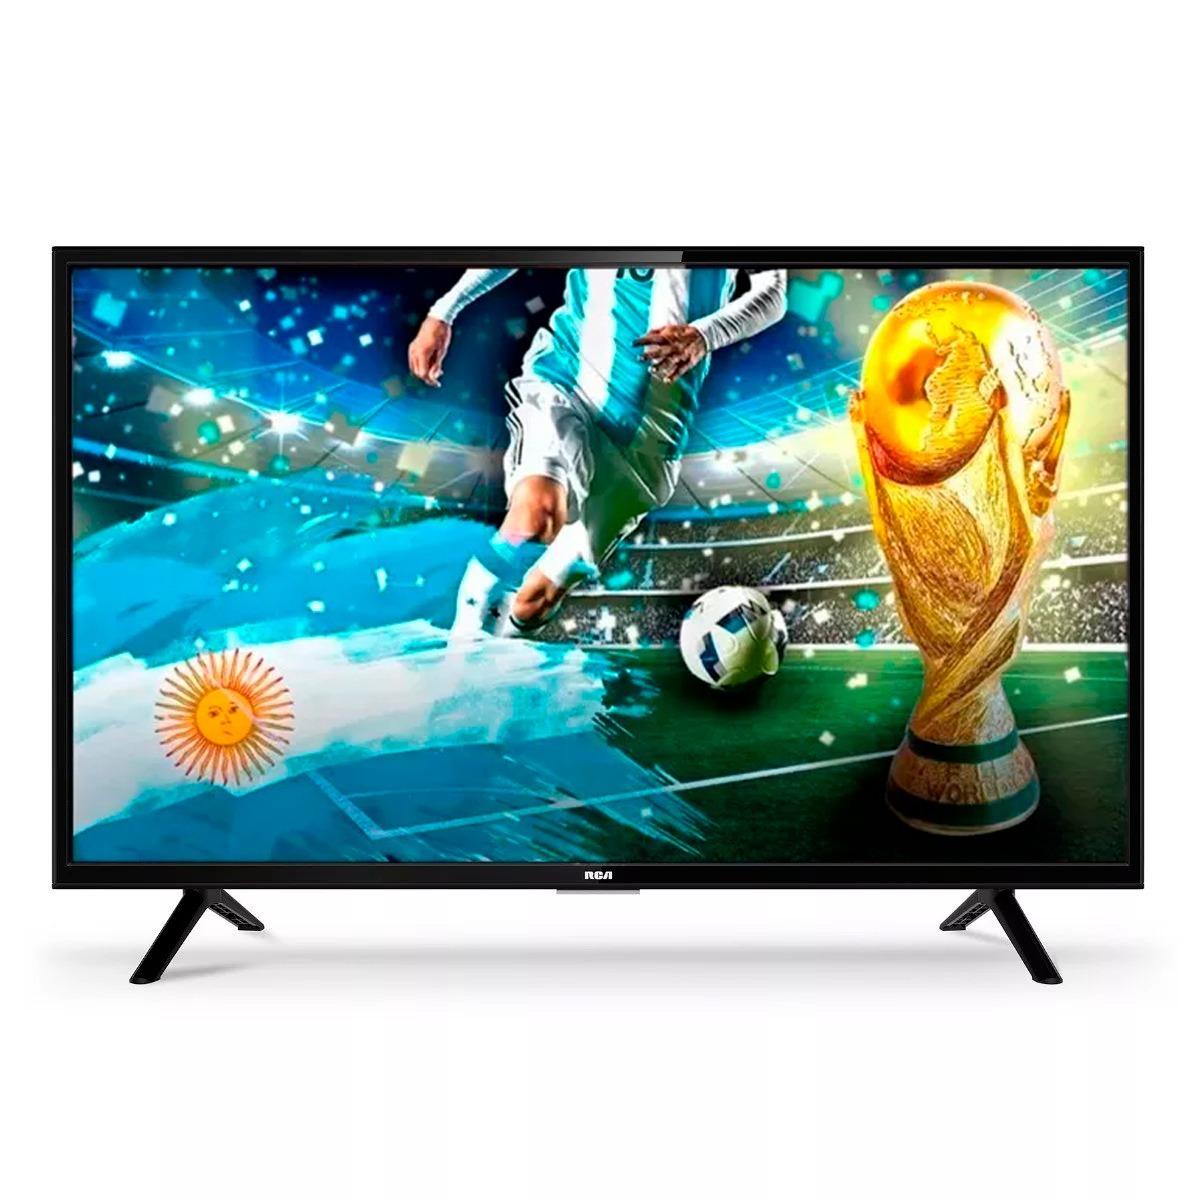 8a3ae15cb27e9 smart tv led 49 pulgadas full hd rca hdmi x3 netflix wifi  9. Cargando zoom.